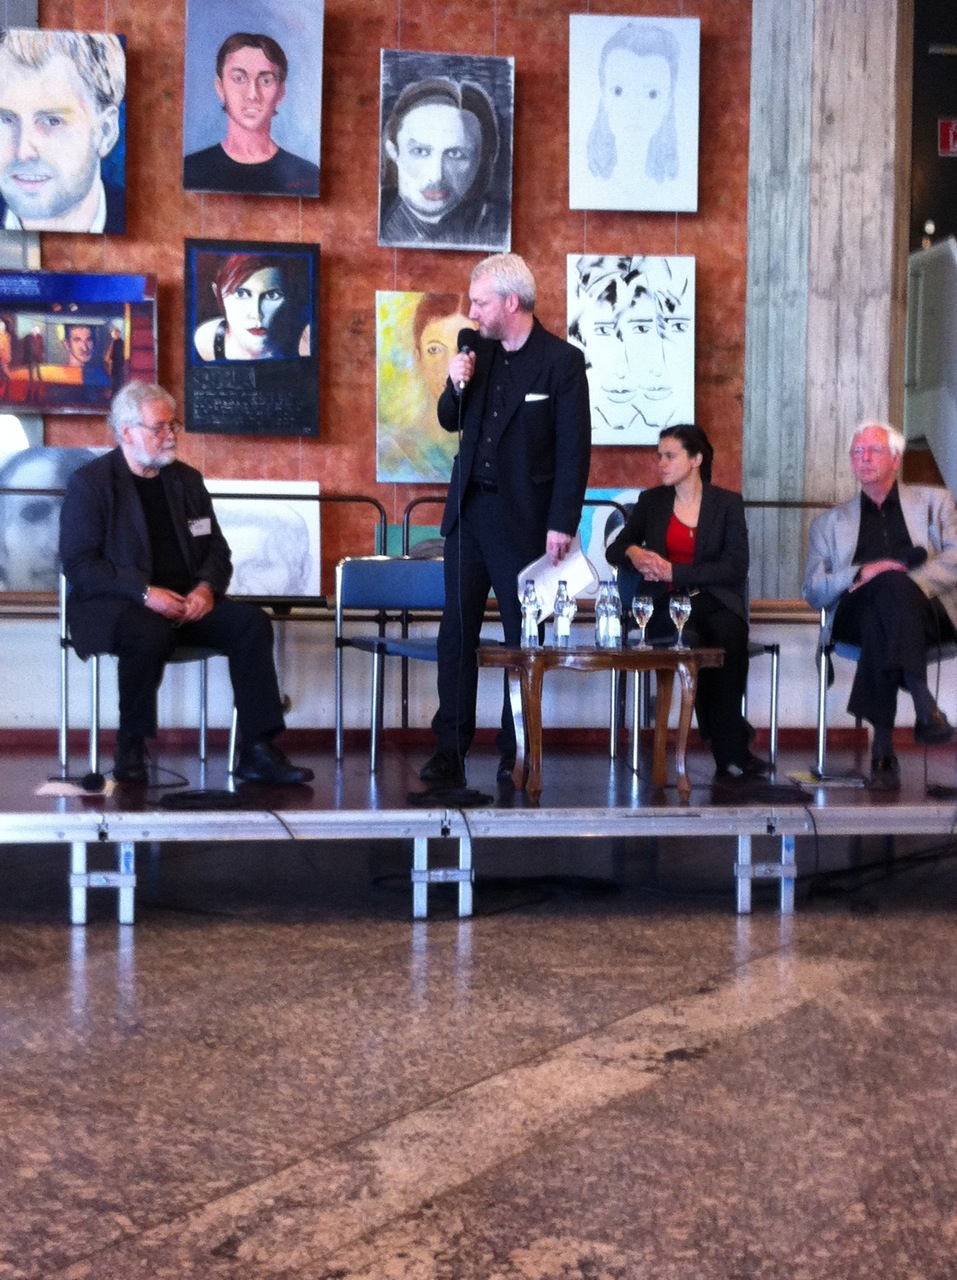 Podiumsdiskussion zur MUTHEA-Tagung 2012 in Karlsruhe